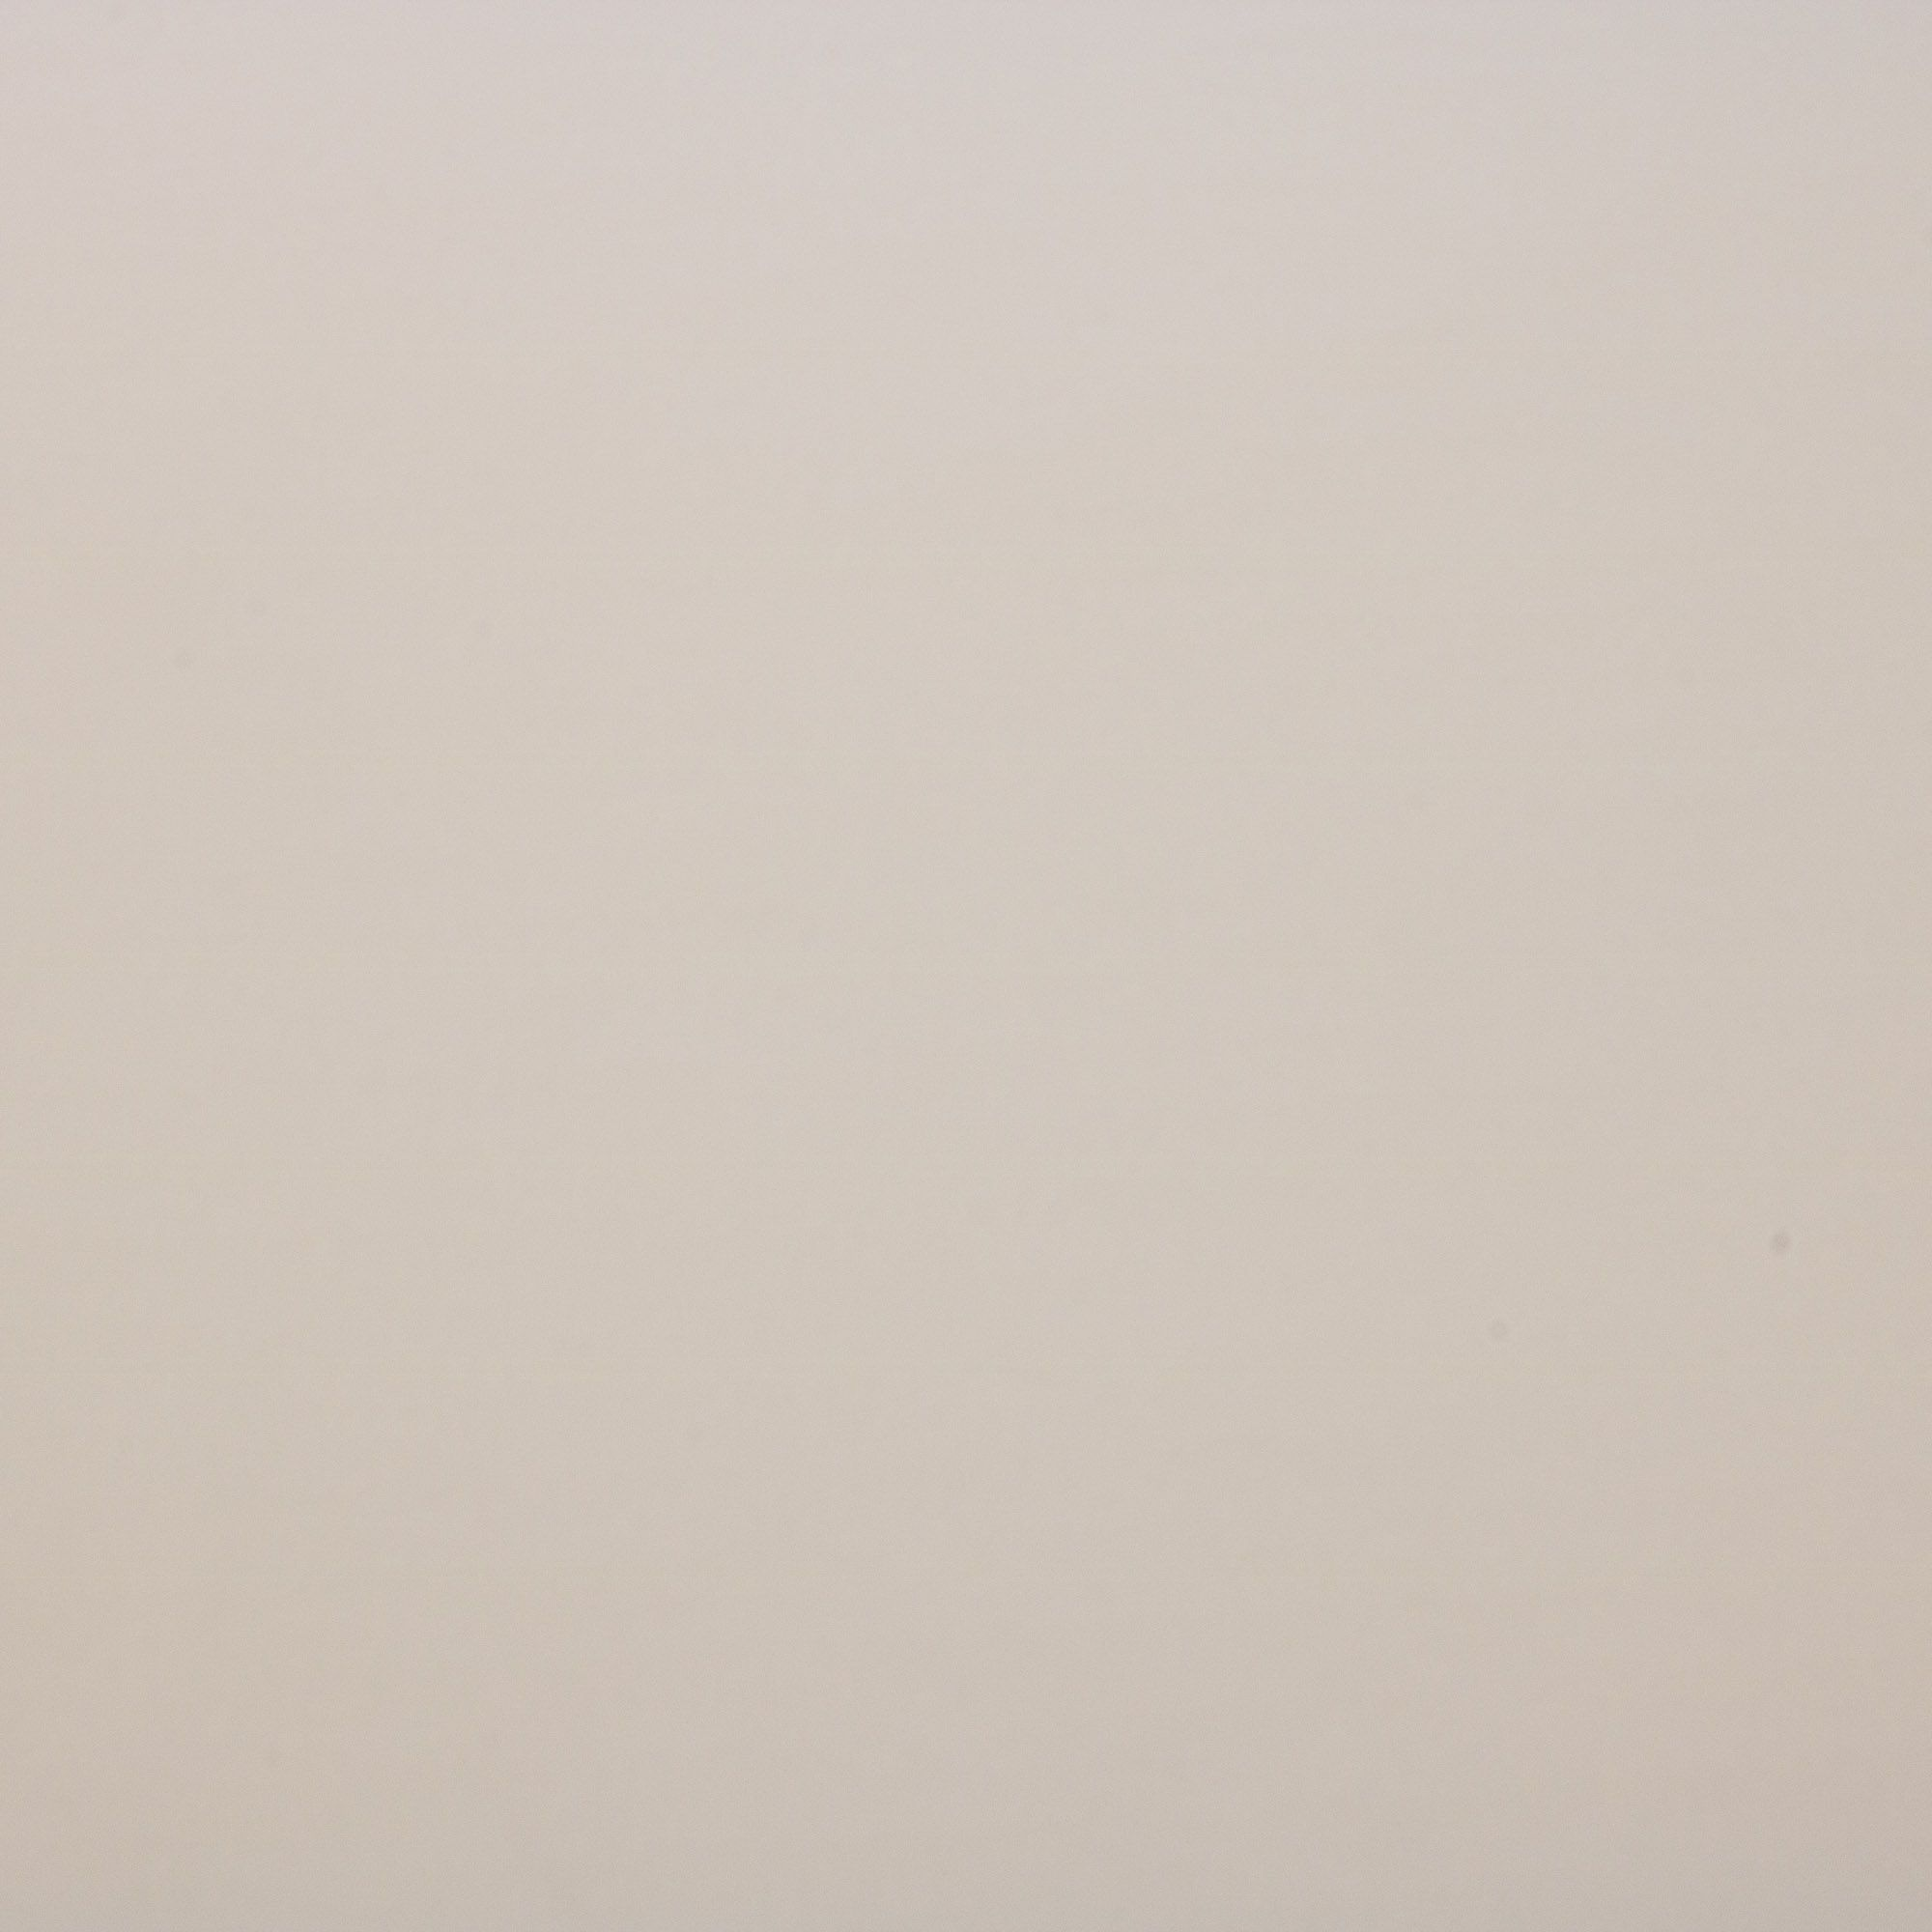 Tecido Malha Neoprene Branco 95% Poliester 5% Elastano